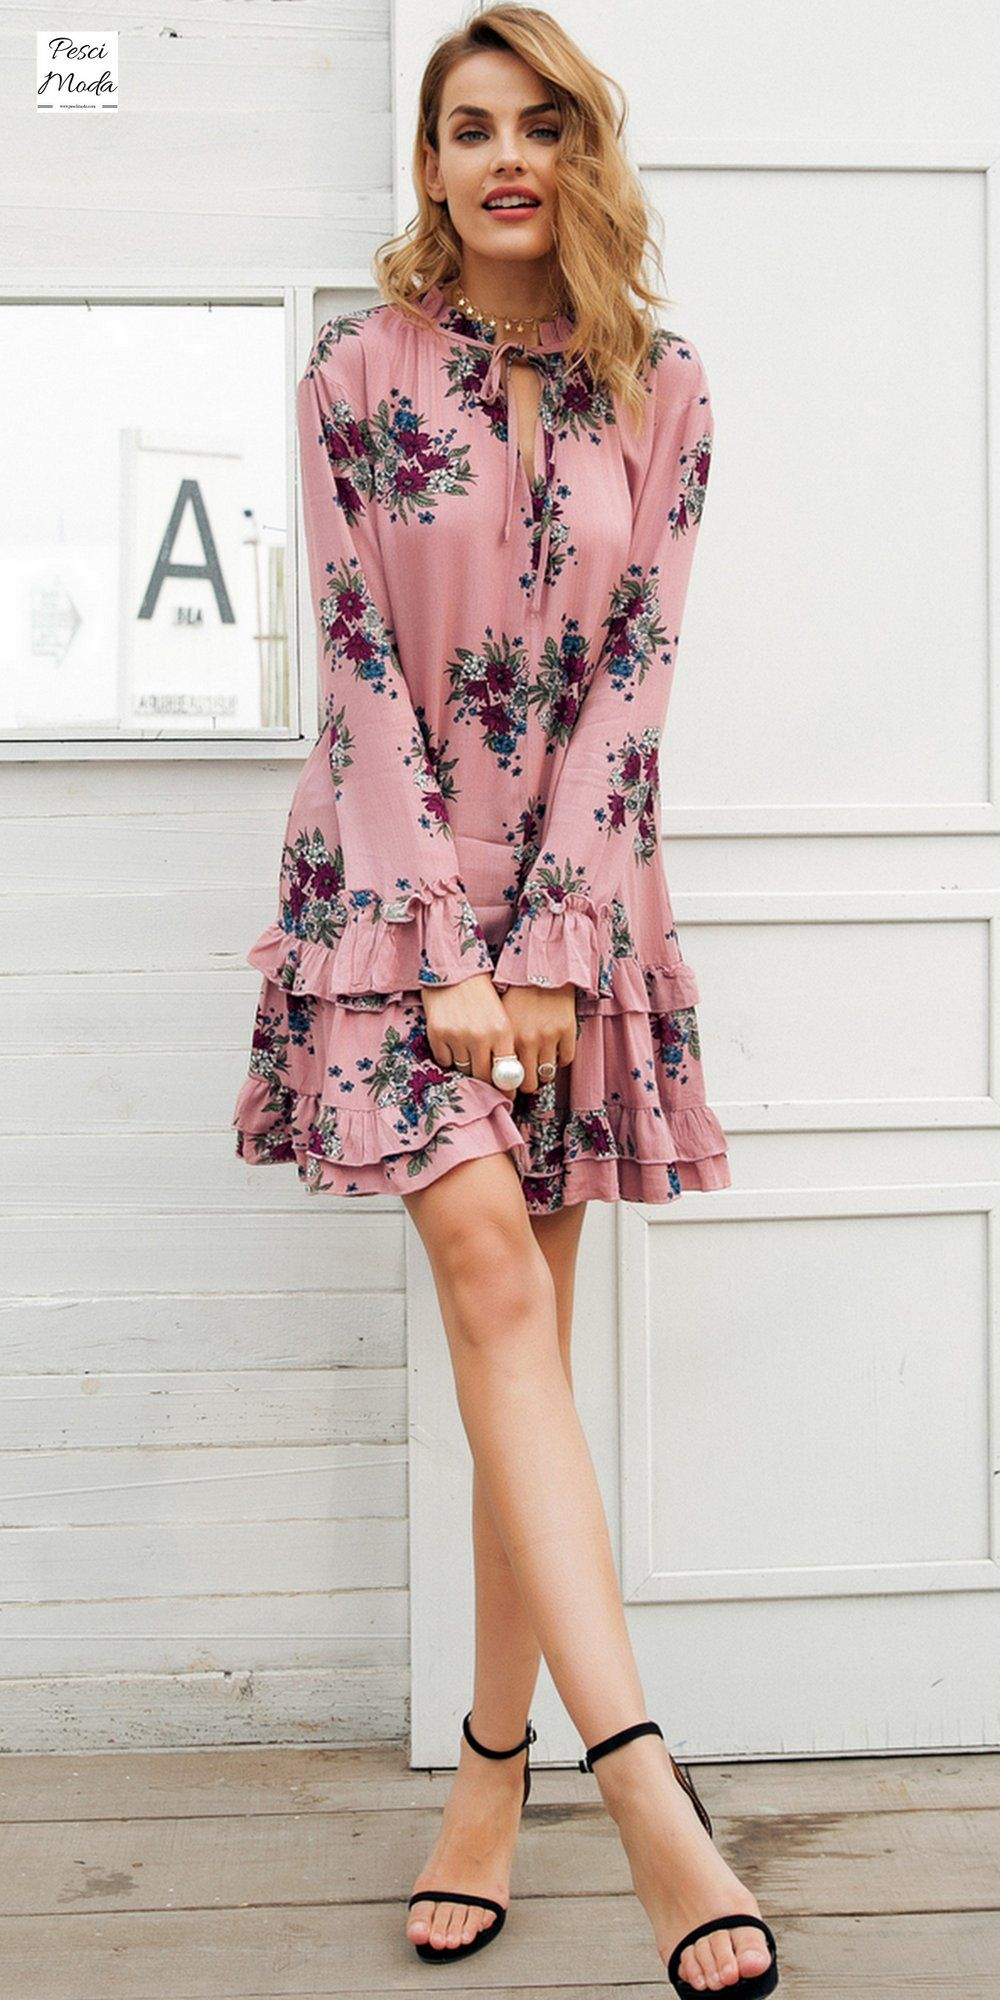 Bohemian High Neck Short Dress Boho Style Trends Pinterest